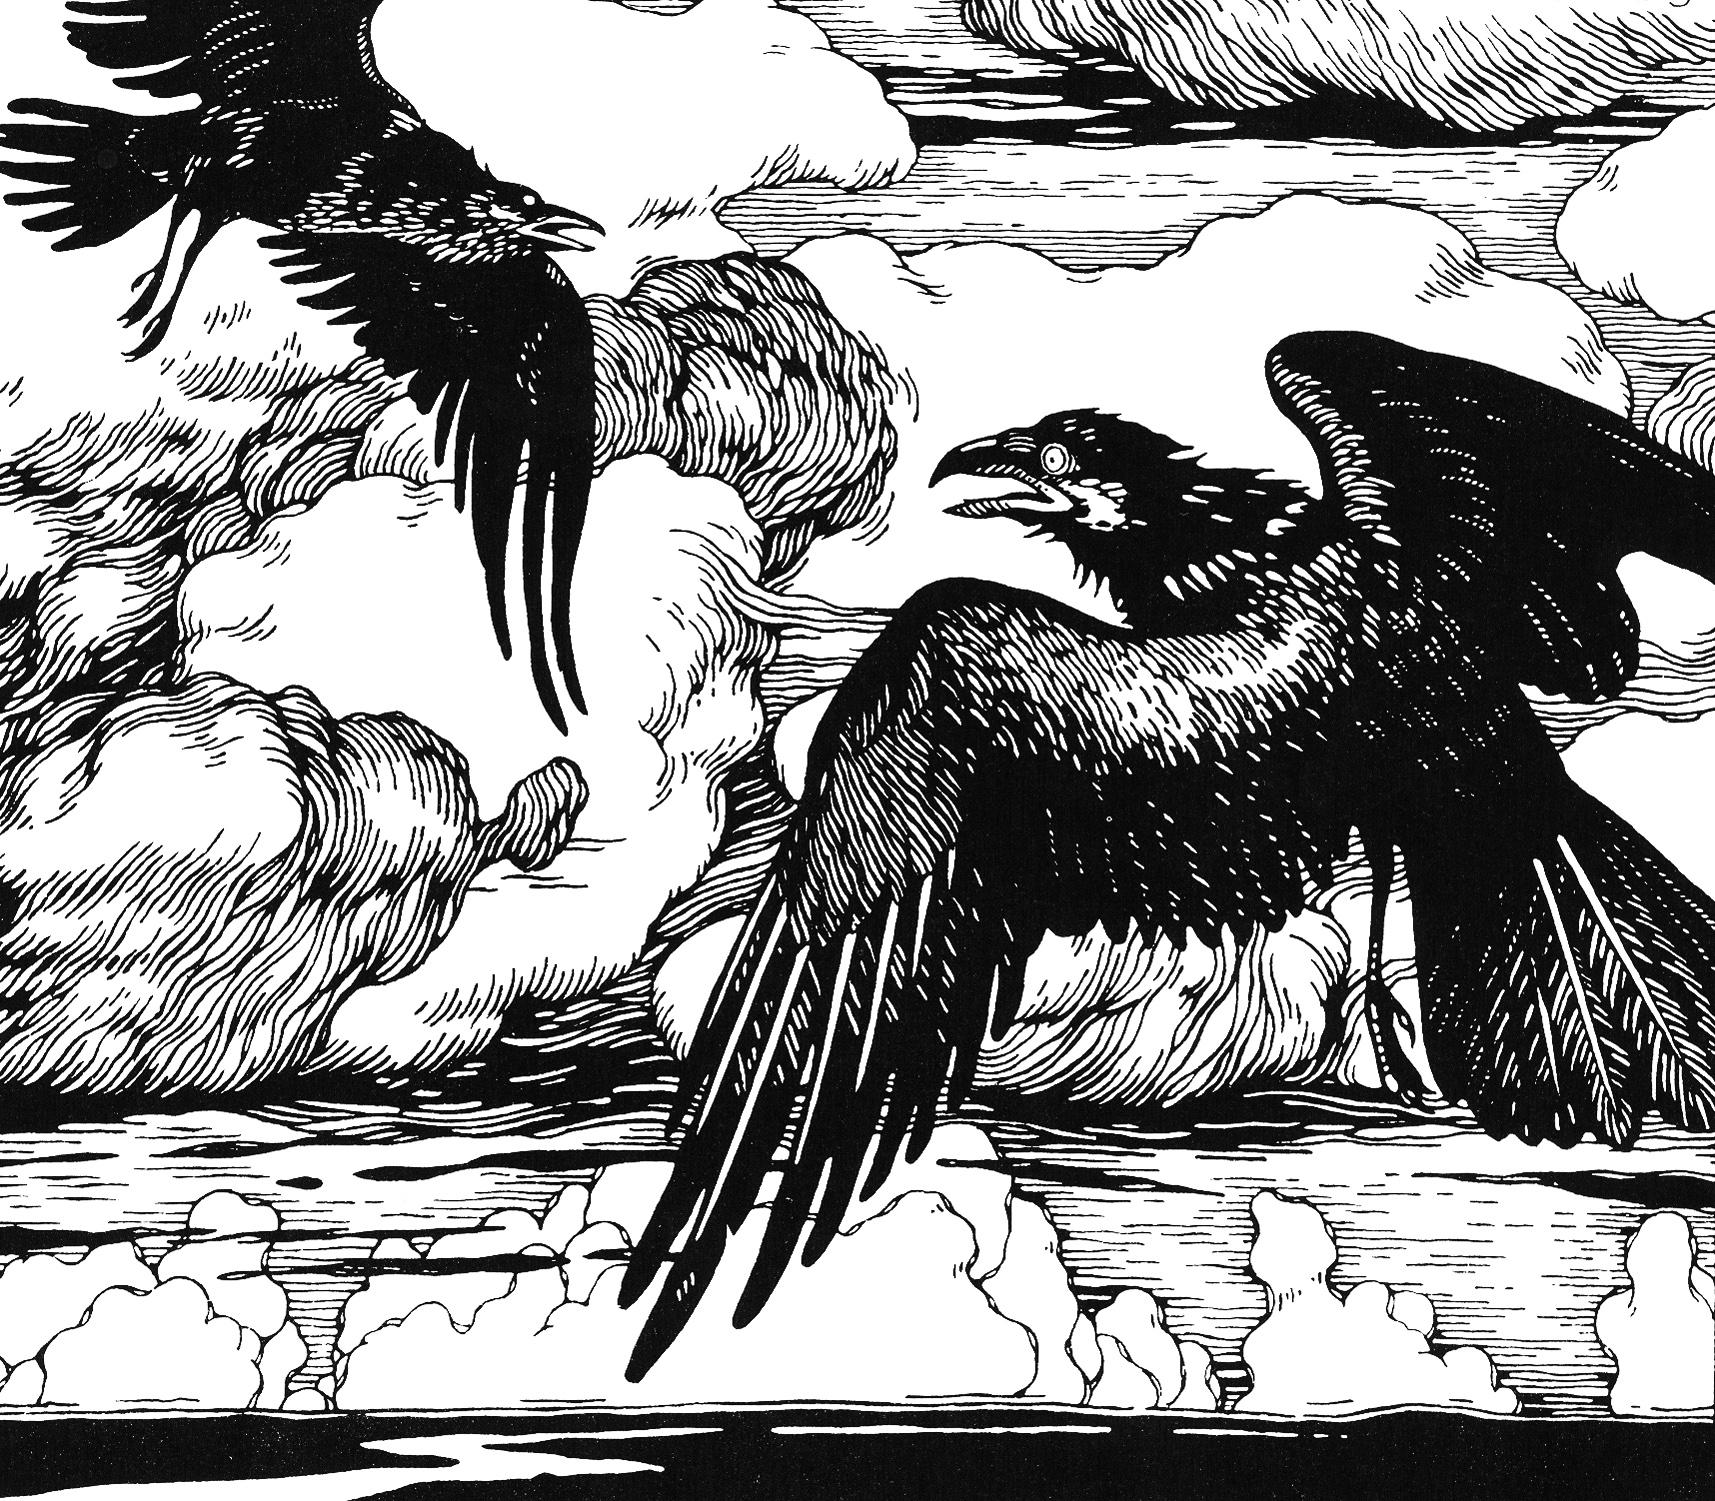 bilibin_crows.jpg